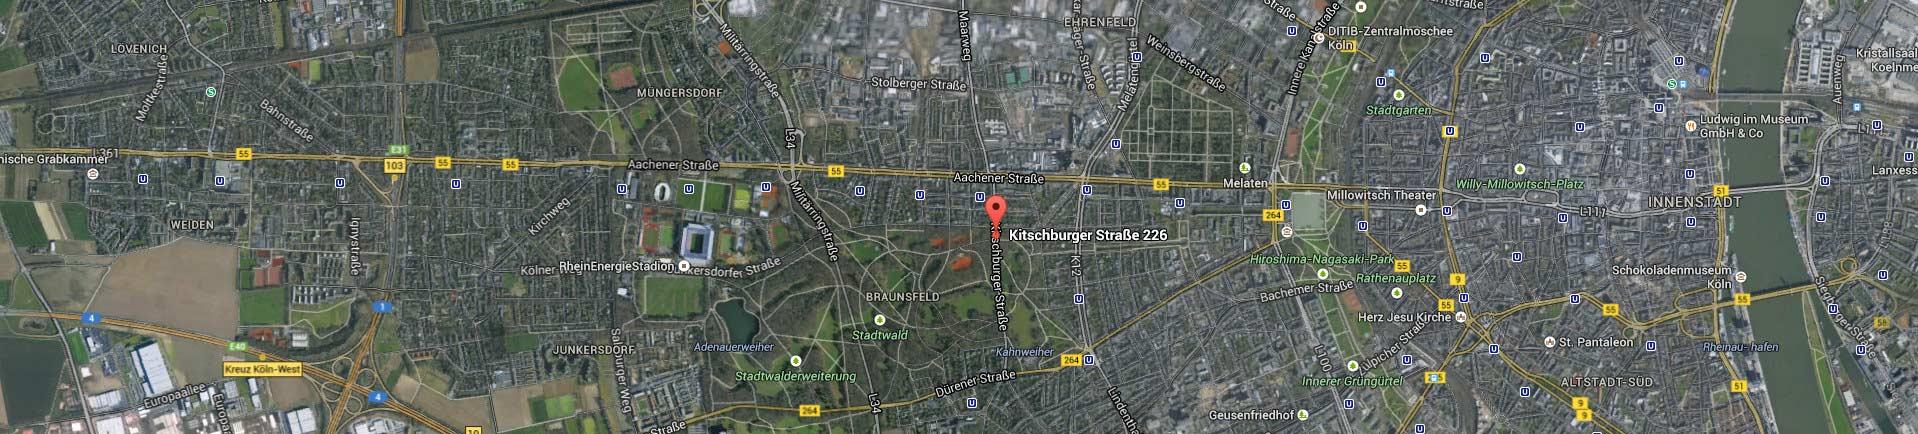 Kontakt_Karte_Kitschburger Str. 226; Köln